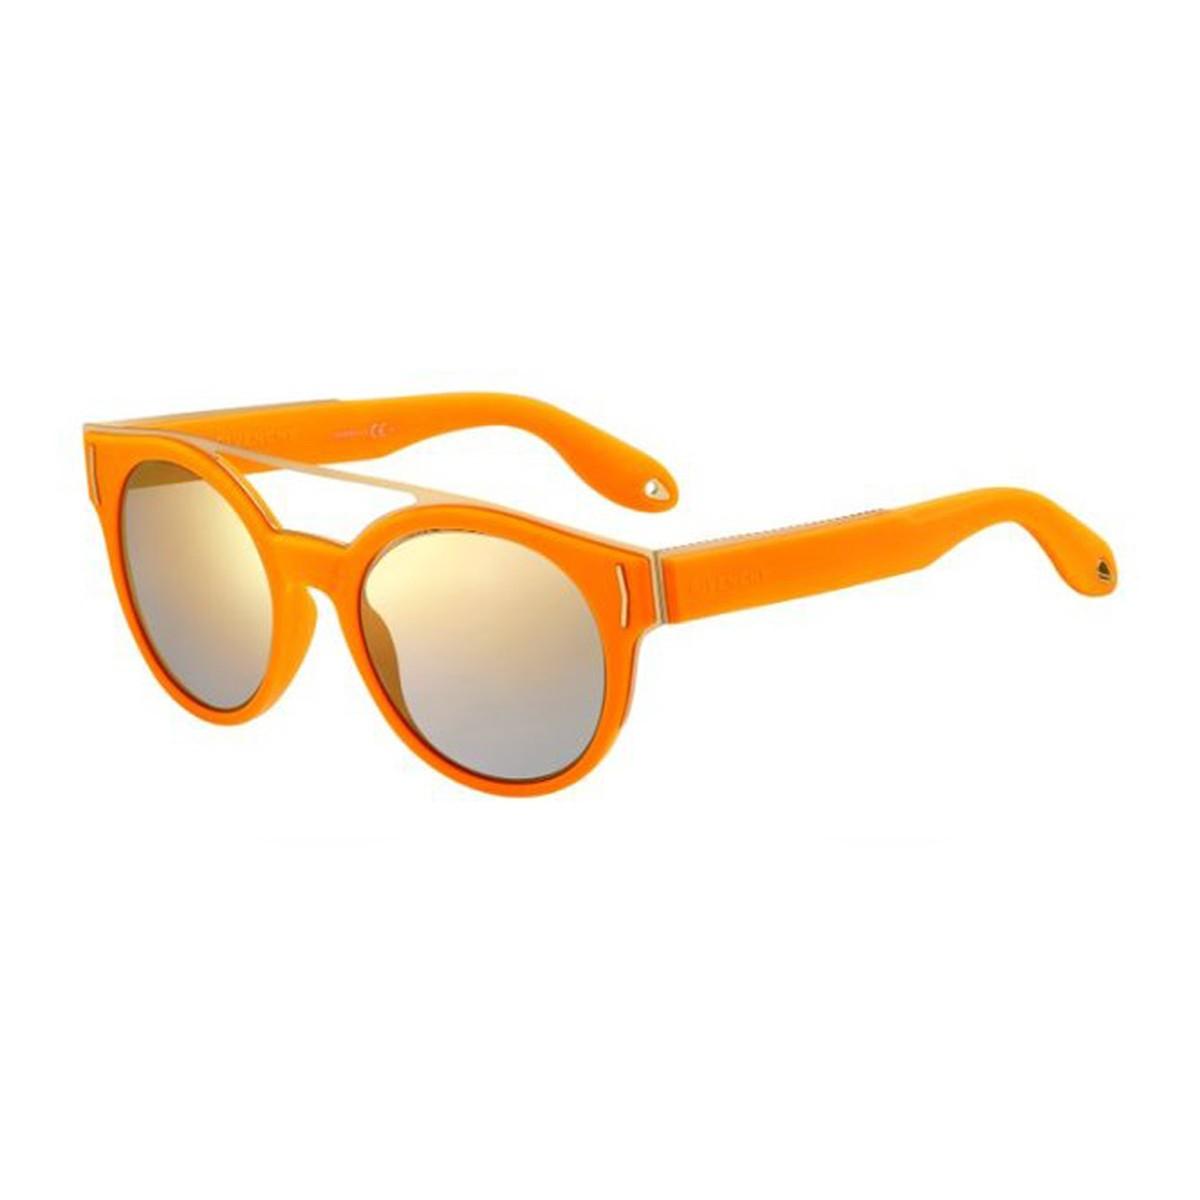 Givenchy GV7017/s | Occhiali da Sole